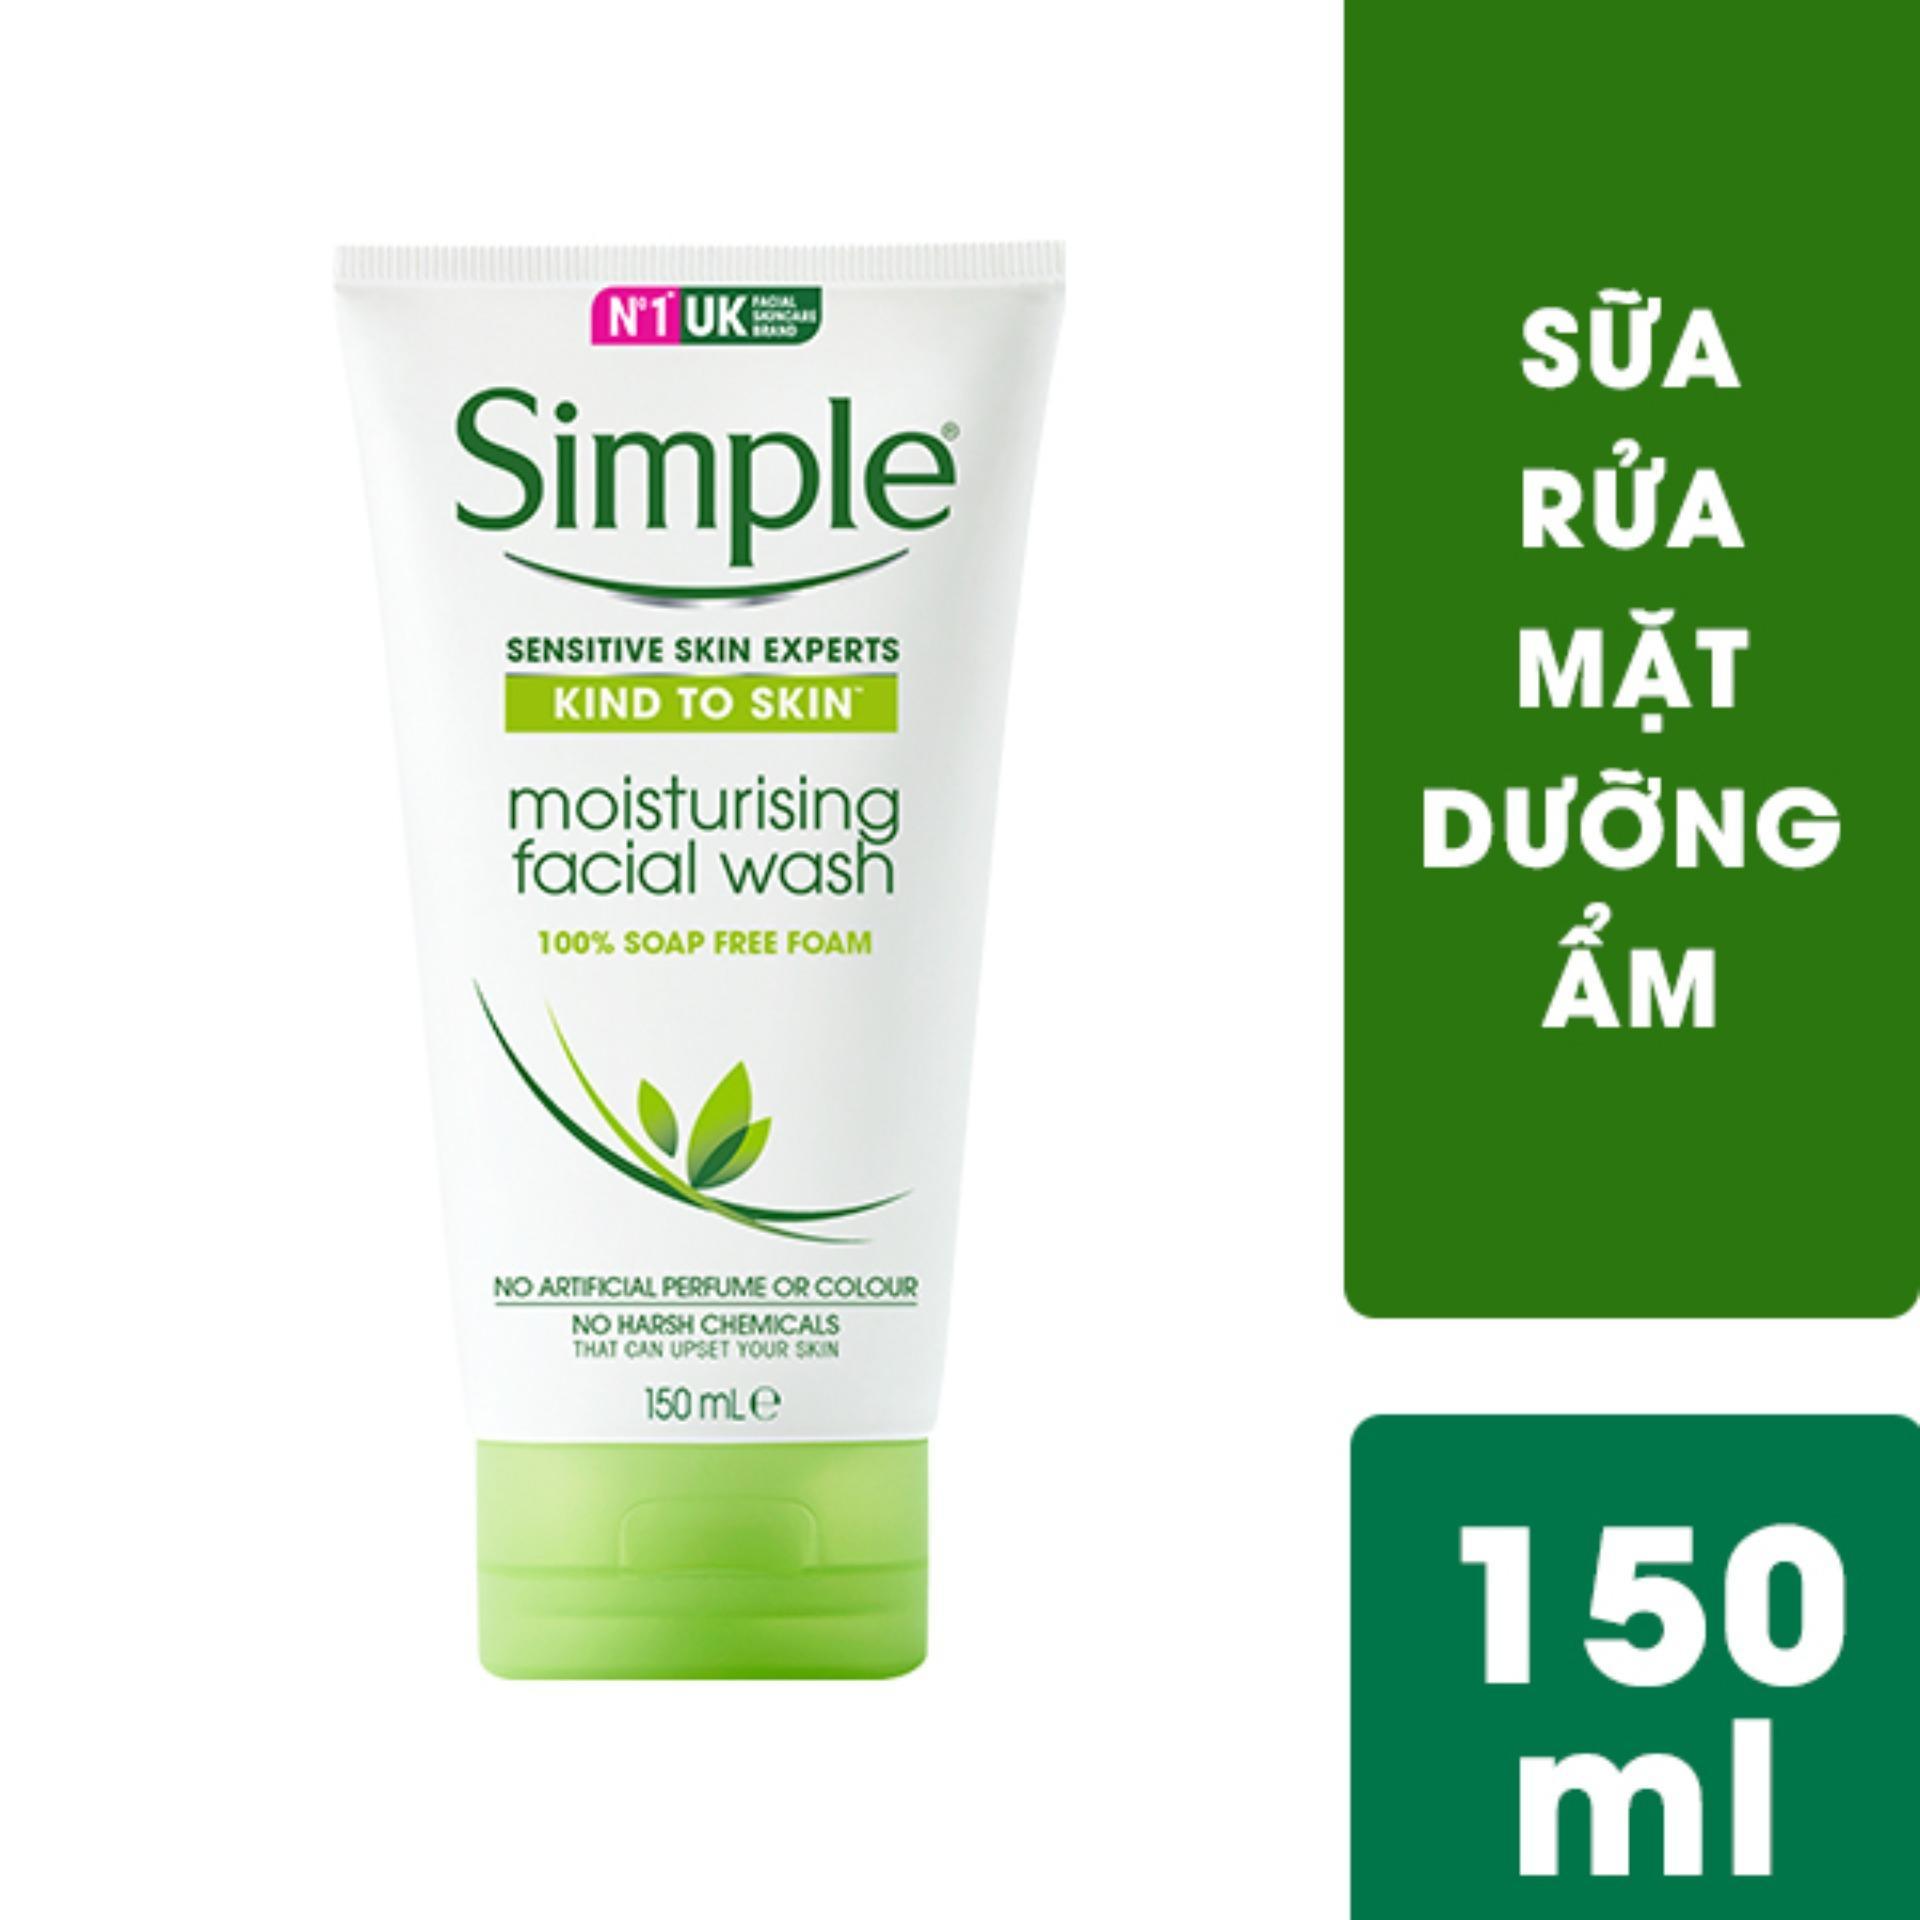 Sữa rửa mặt dưỡng ẩm dạng gel Simple Moisturising Facial Wash 150ml tốt nhất